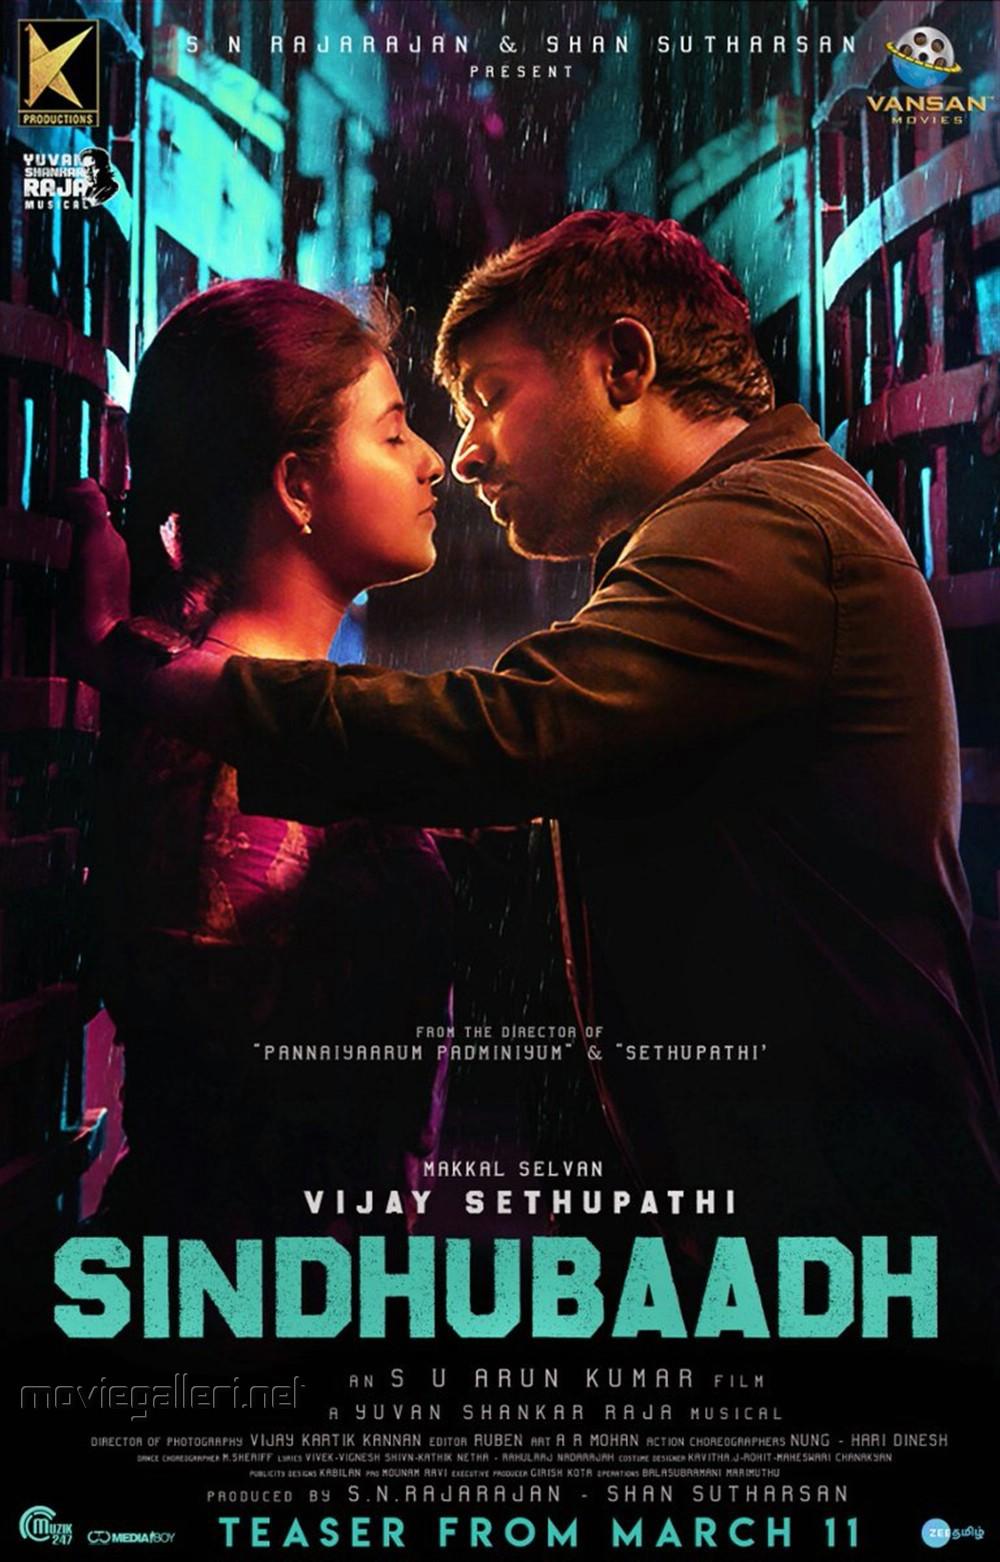 Anjali Vijay Sethupathi Sindhubaadh Movie Second Look Posters HD